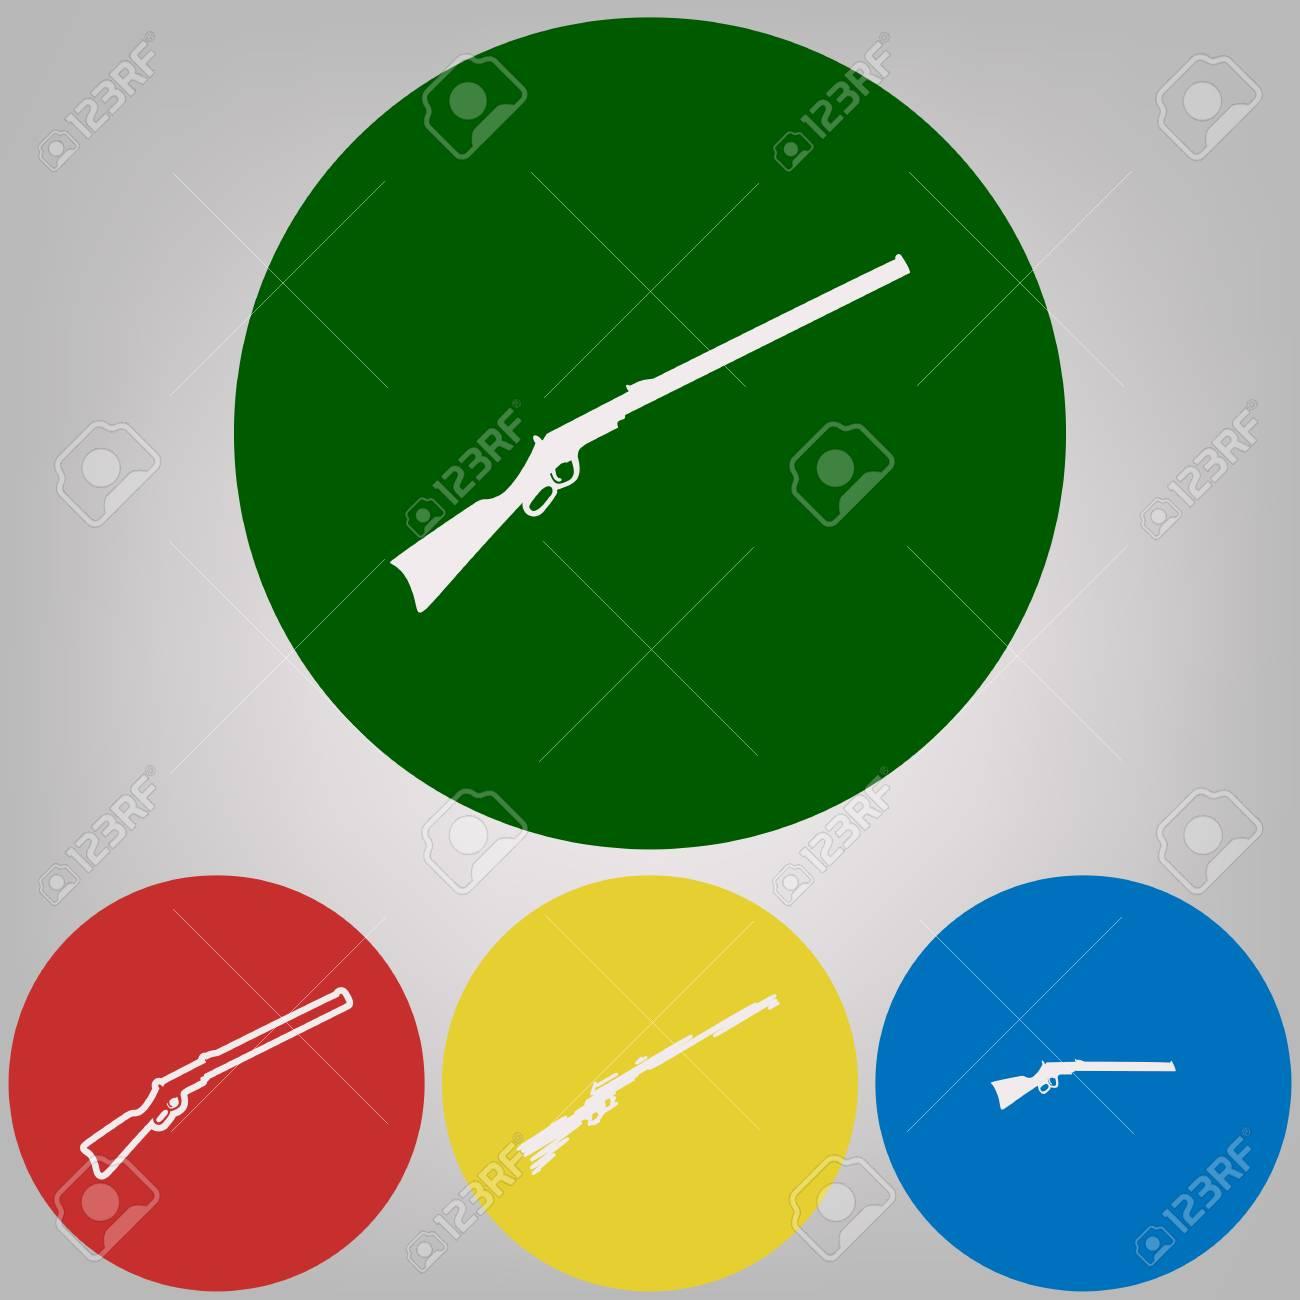 Hunting rifle icon vector illustration  Silhouette gun  Vector